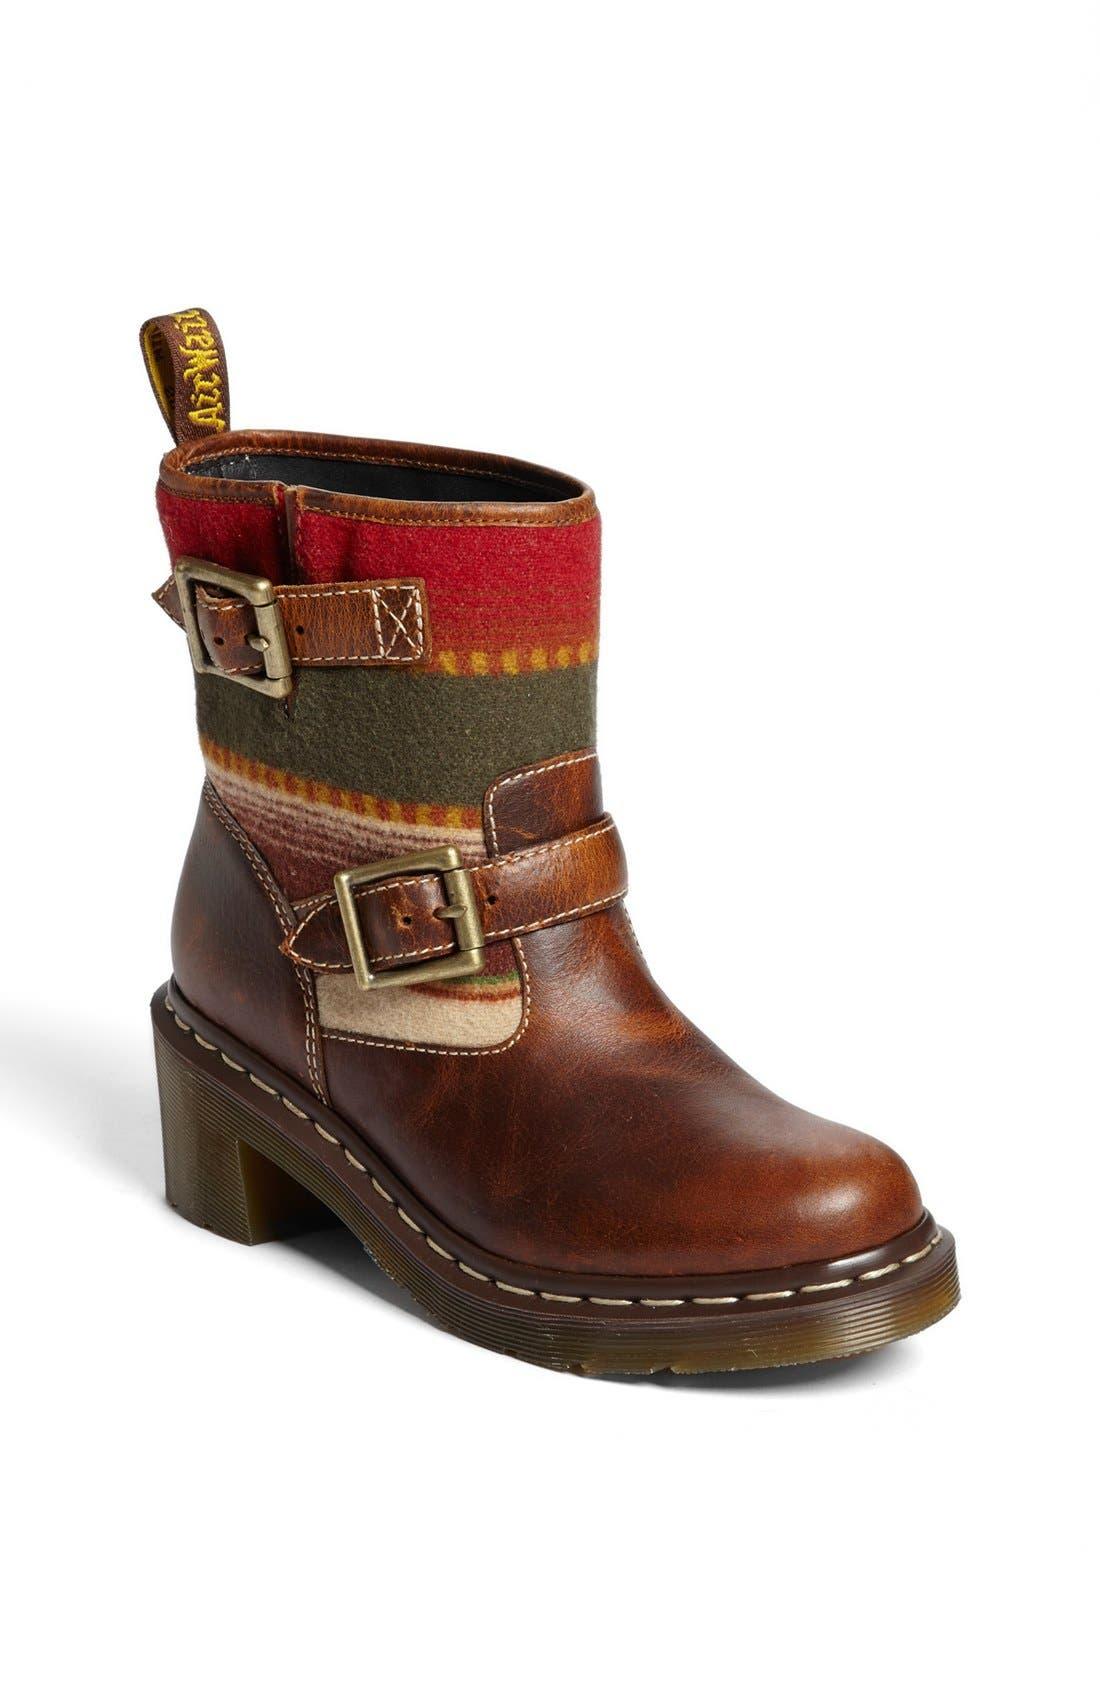 Main Image - Pendleton for Dr. Martens Boot